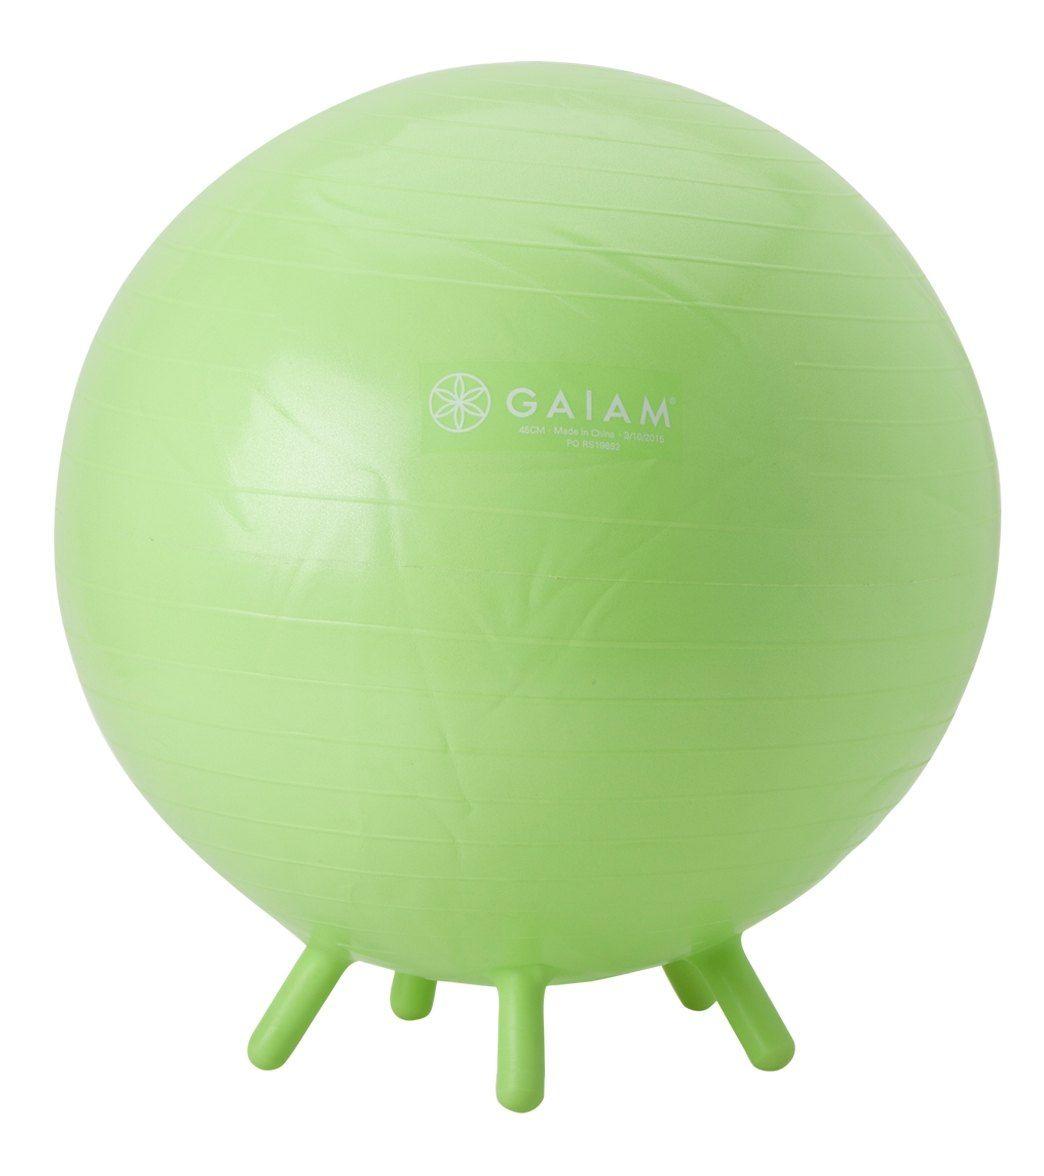 Enjoyable Gaiam Kids Balance Ball Chair Best Yoga Ball Chair Ball Caraccident5 Cool Chair Designs And Ideas Caraccident5Info